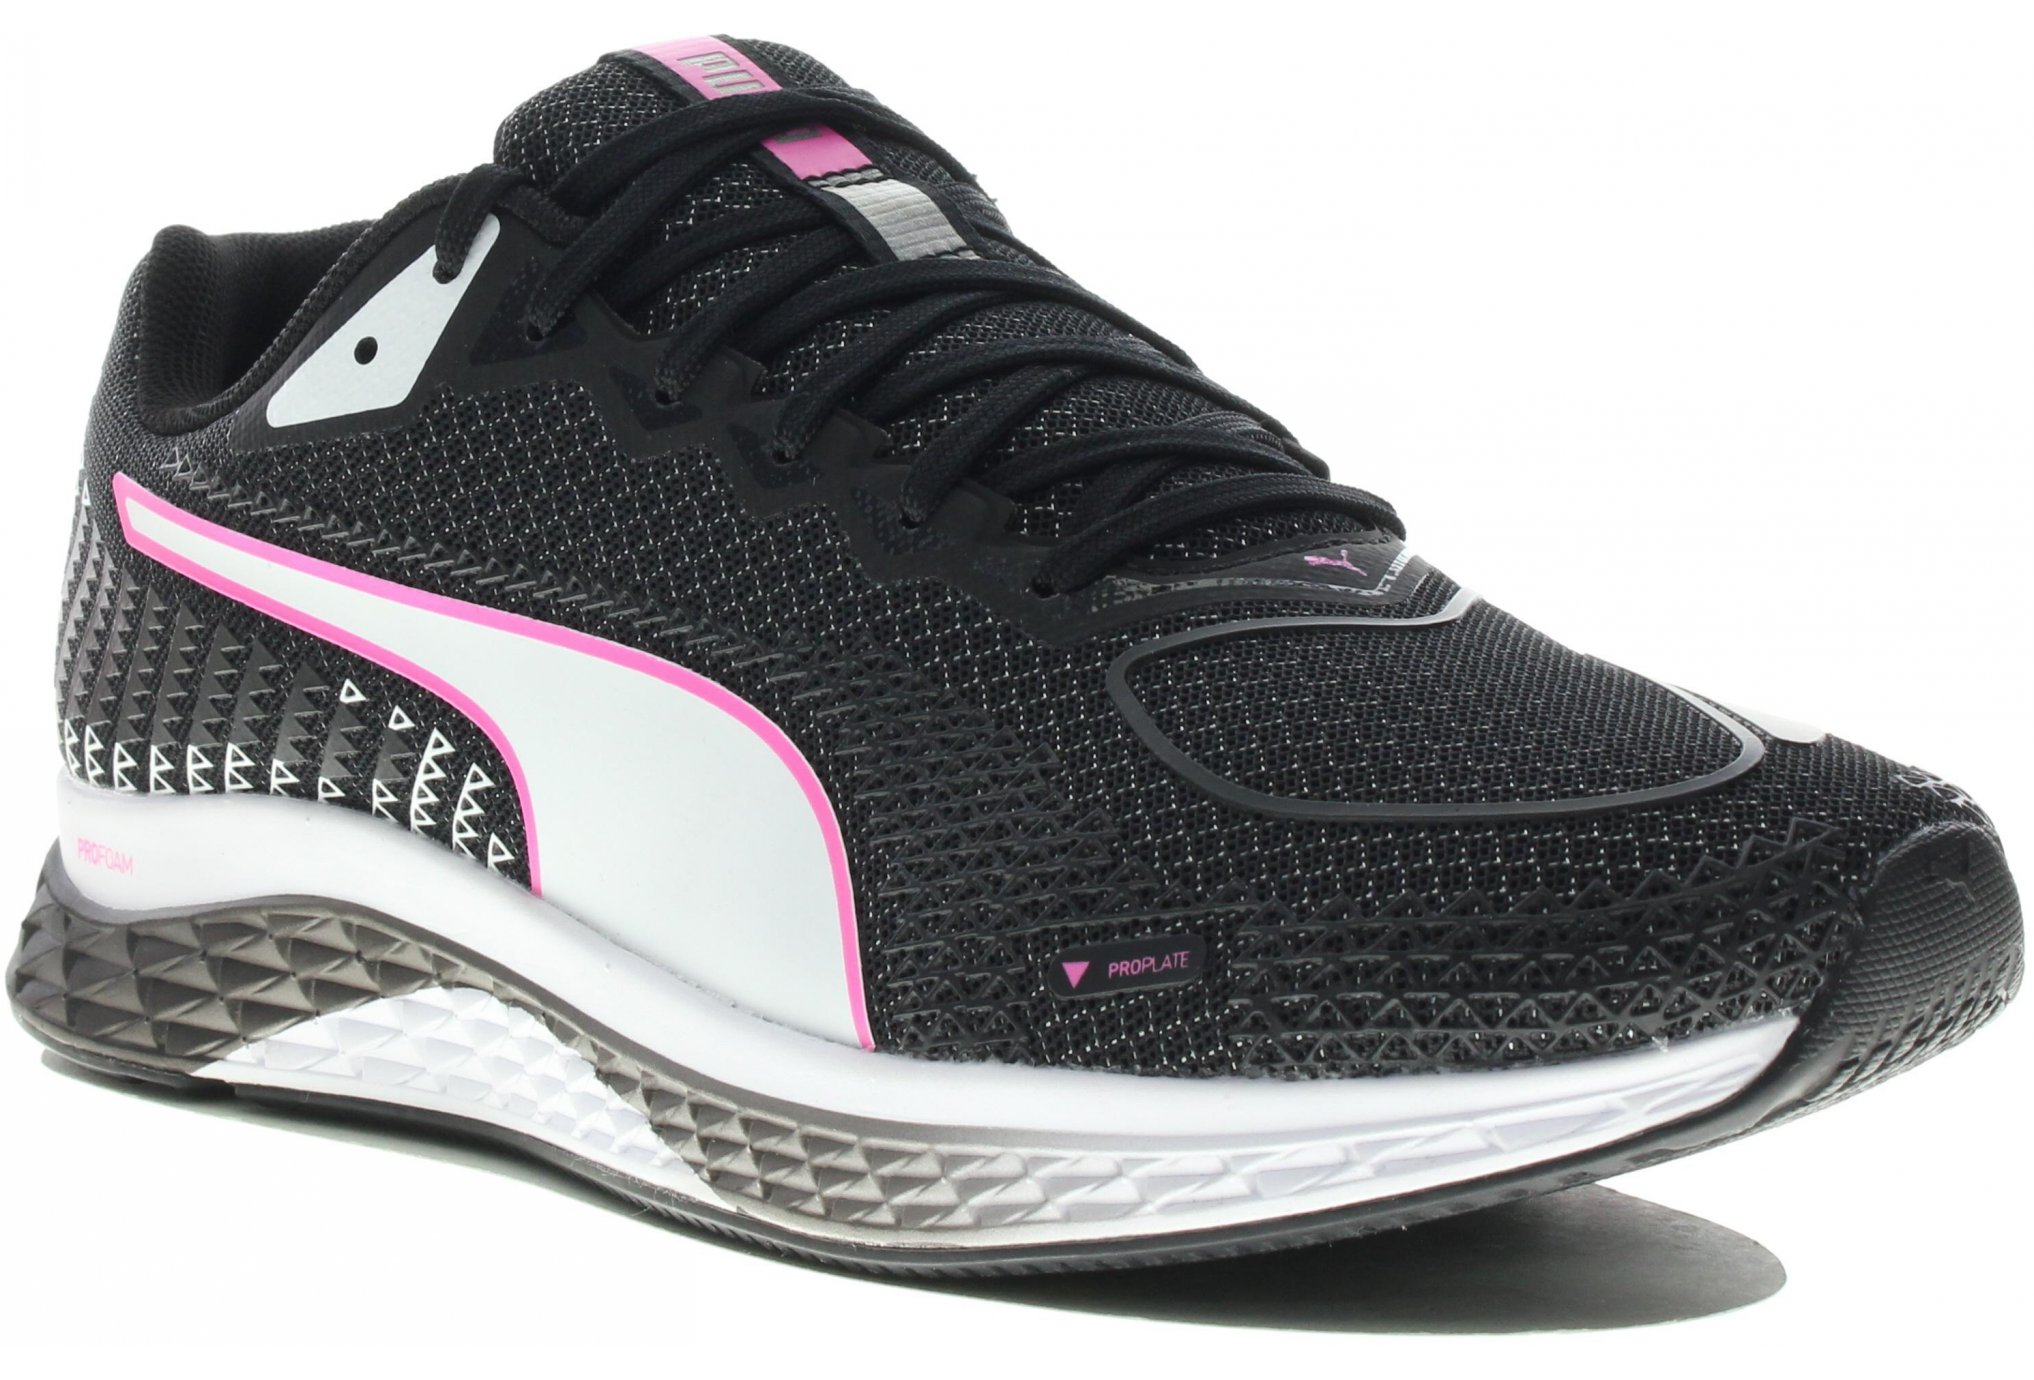 Puma Speed Sutamina 2 W Diététique Chaussures femme